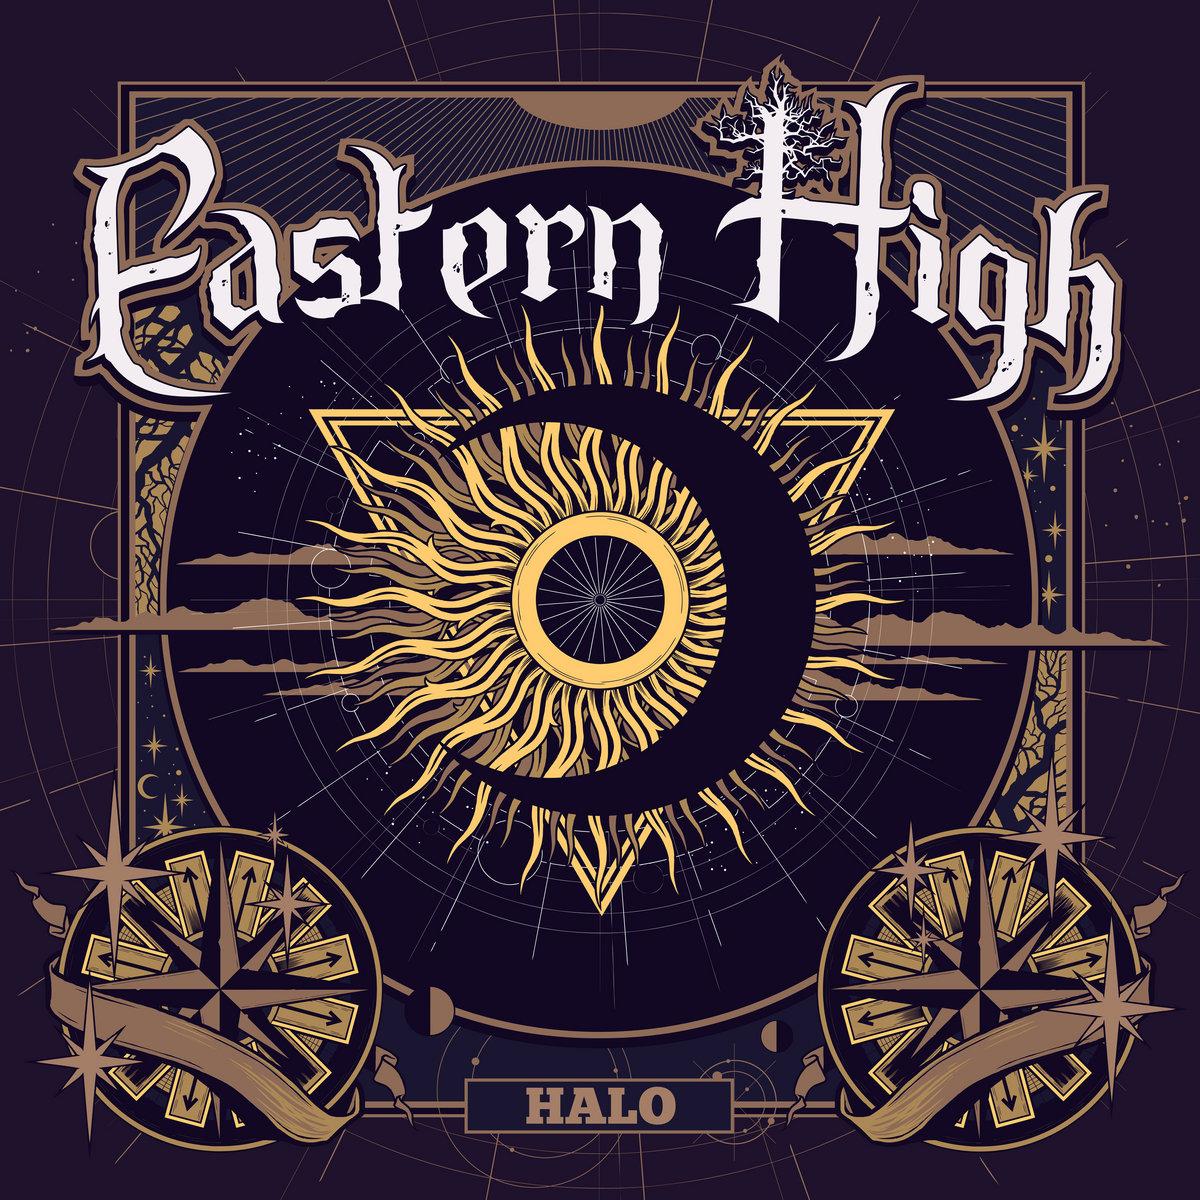 Eastern High: Halo